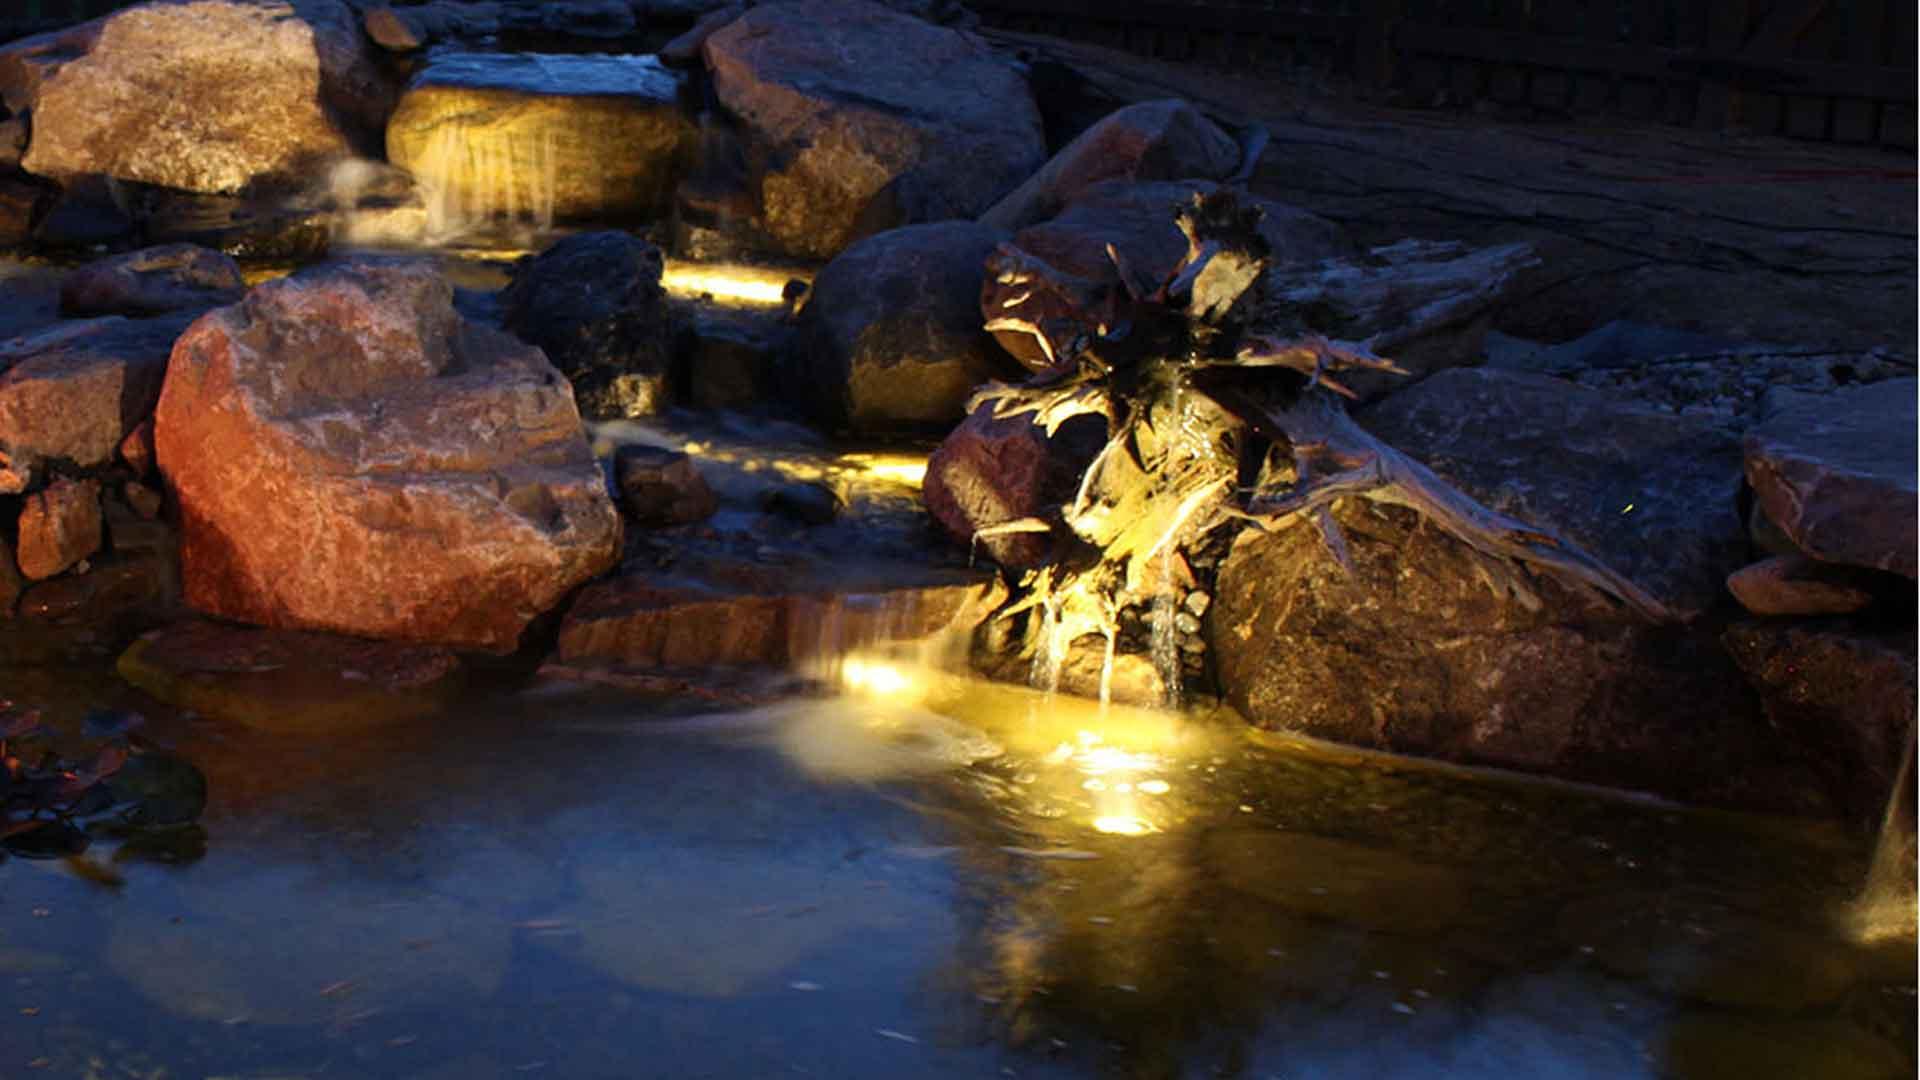 Auburn-Sky-Landscaping-Nighttime-Lighting-Waterfeature-Driftwood.jpg